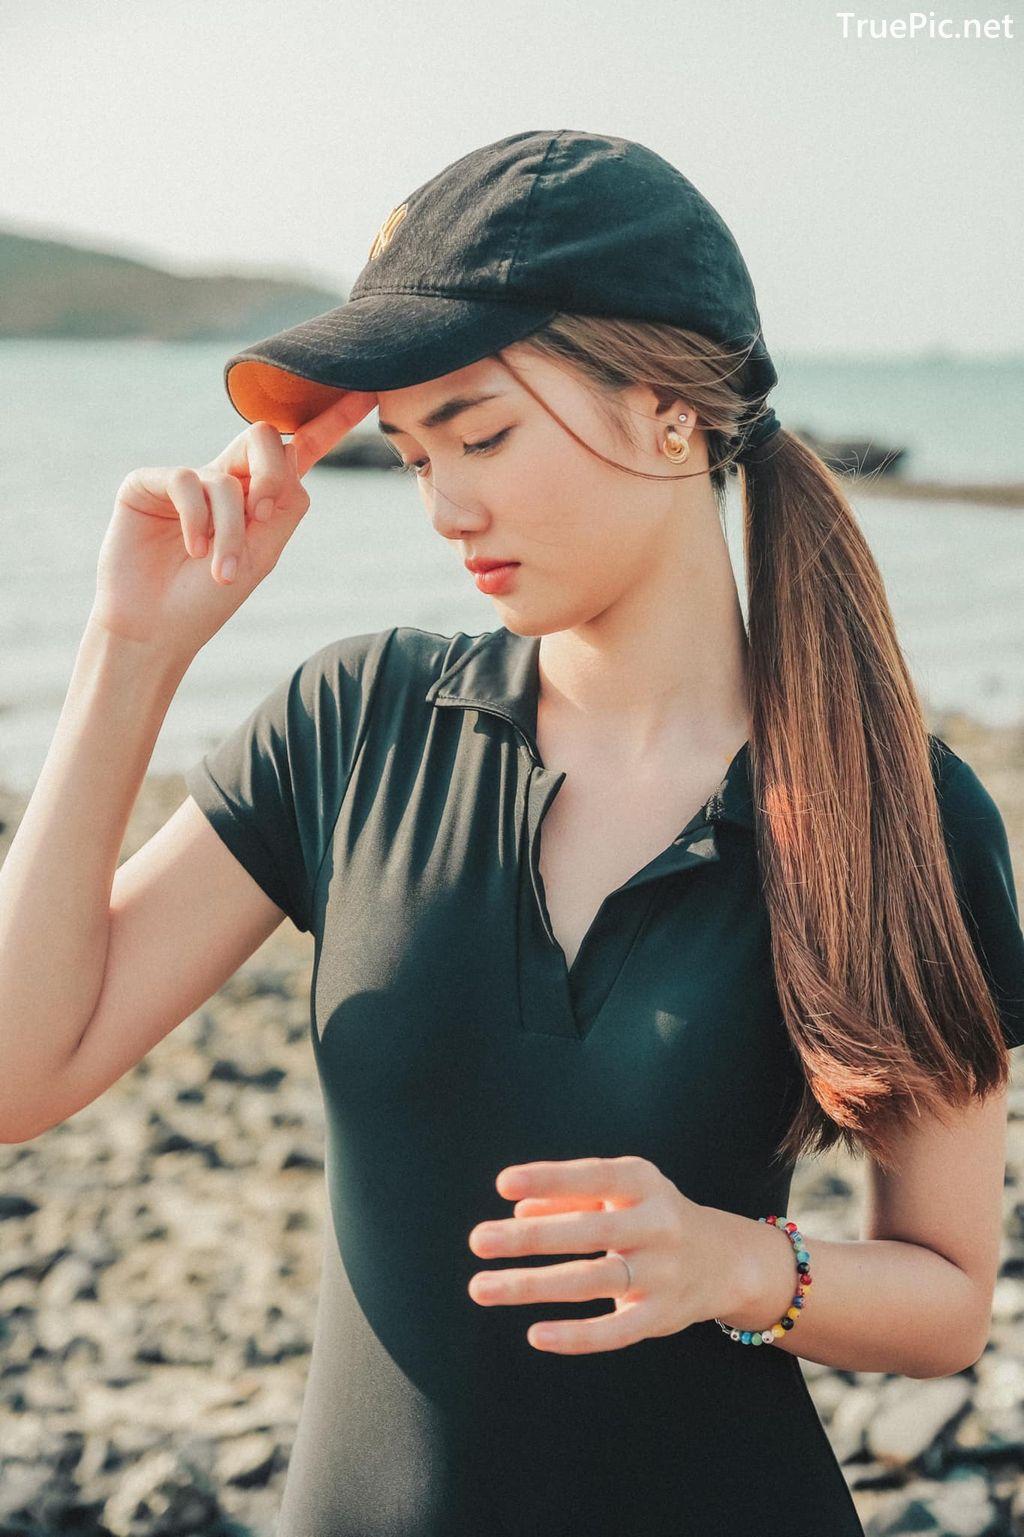 Image-Miss-Teen-Thailand-Kanyarat-Ruangrung-Black-Swimsuit-TruePic.net- Picture-3